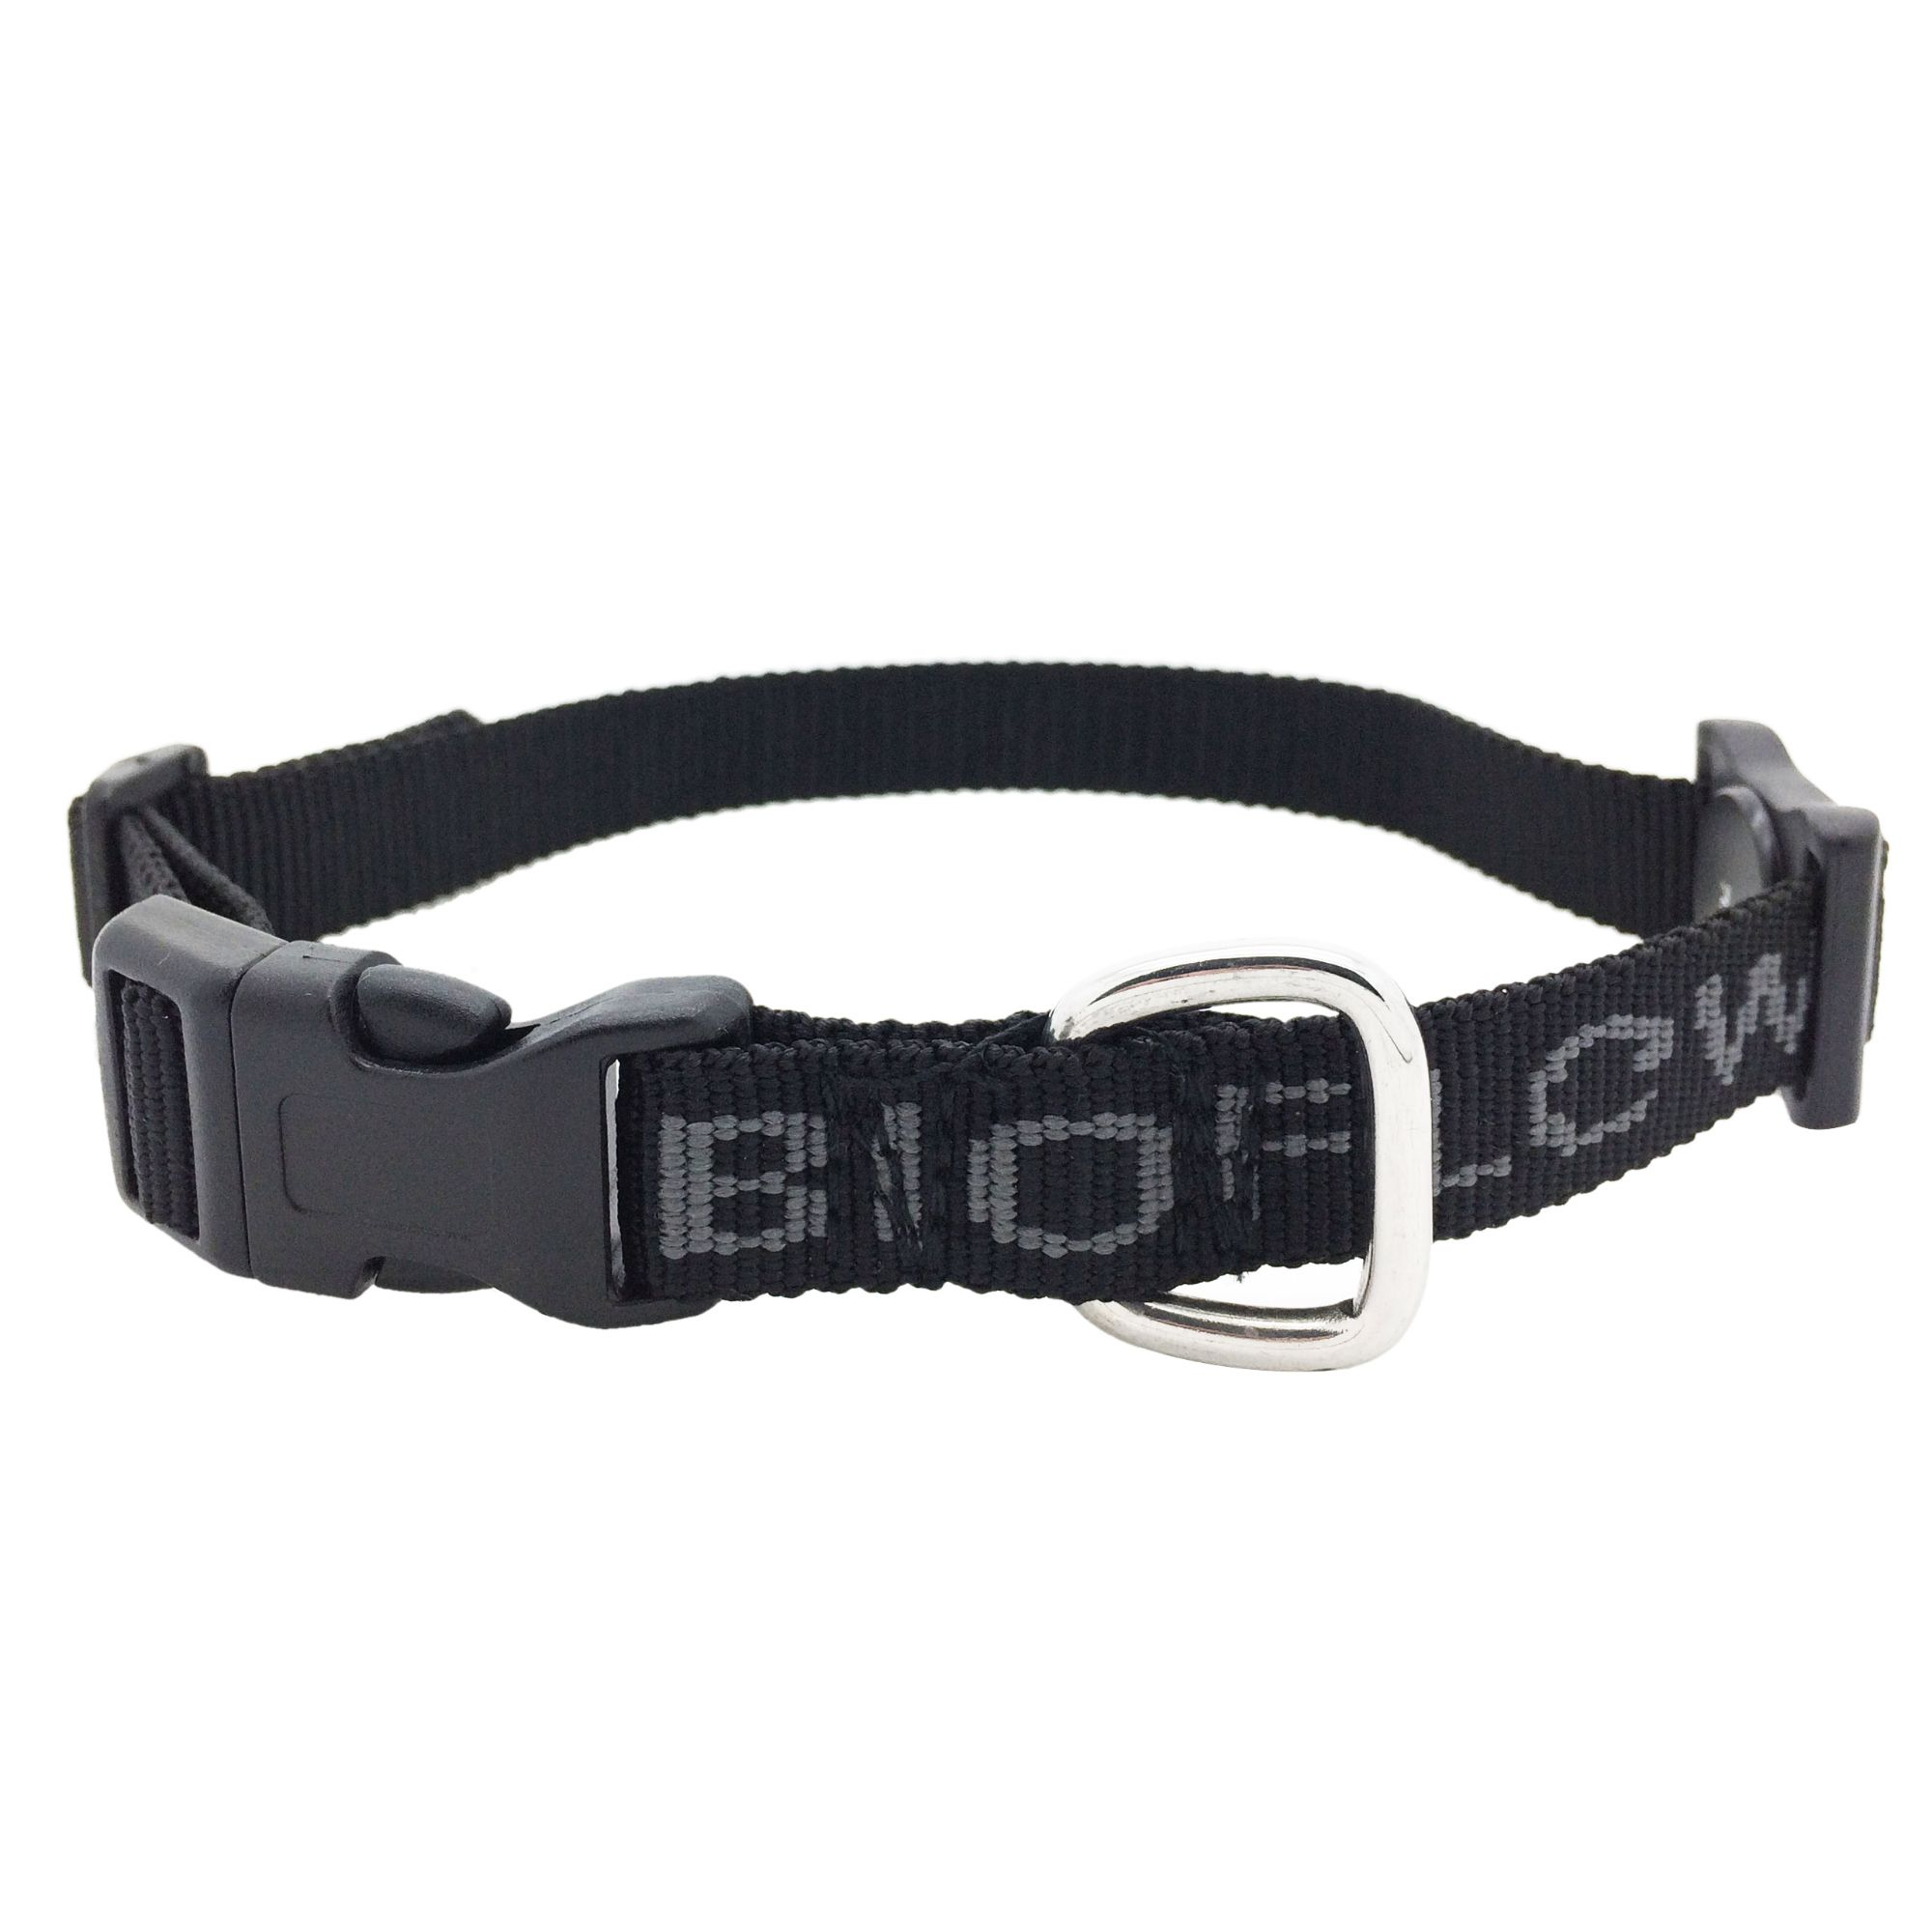 Bioflow magnotherapy dog collar